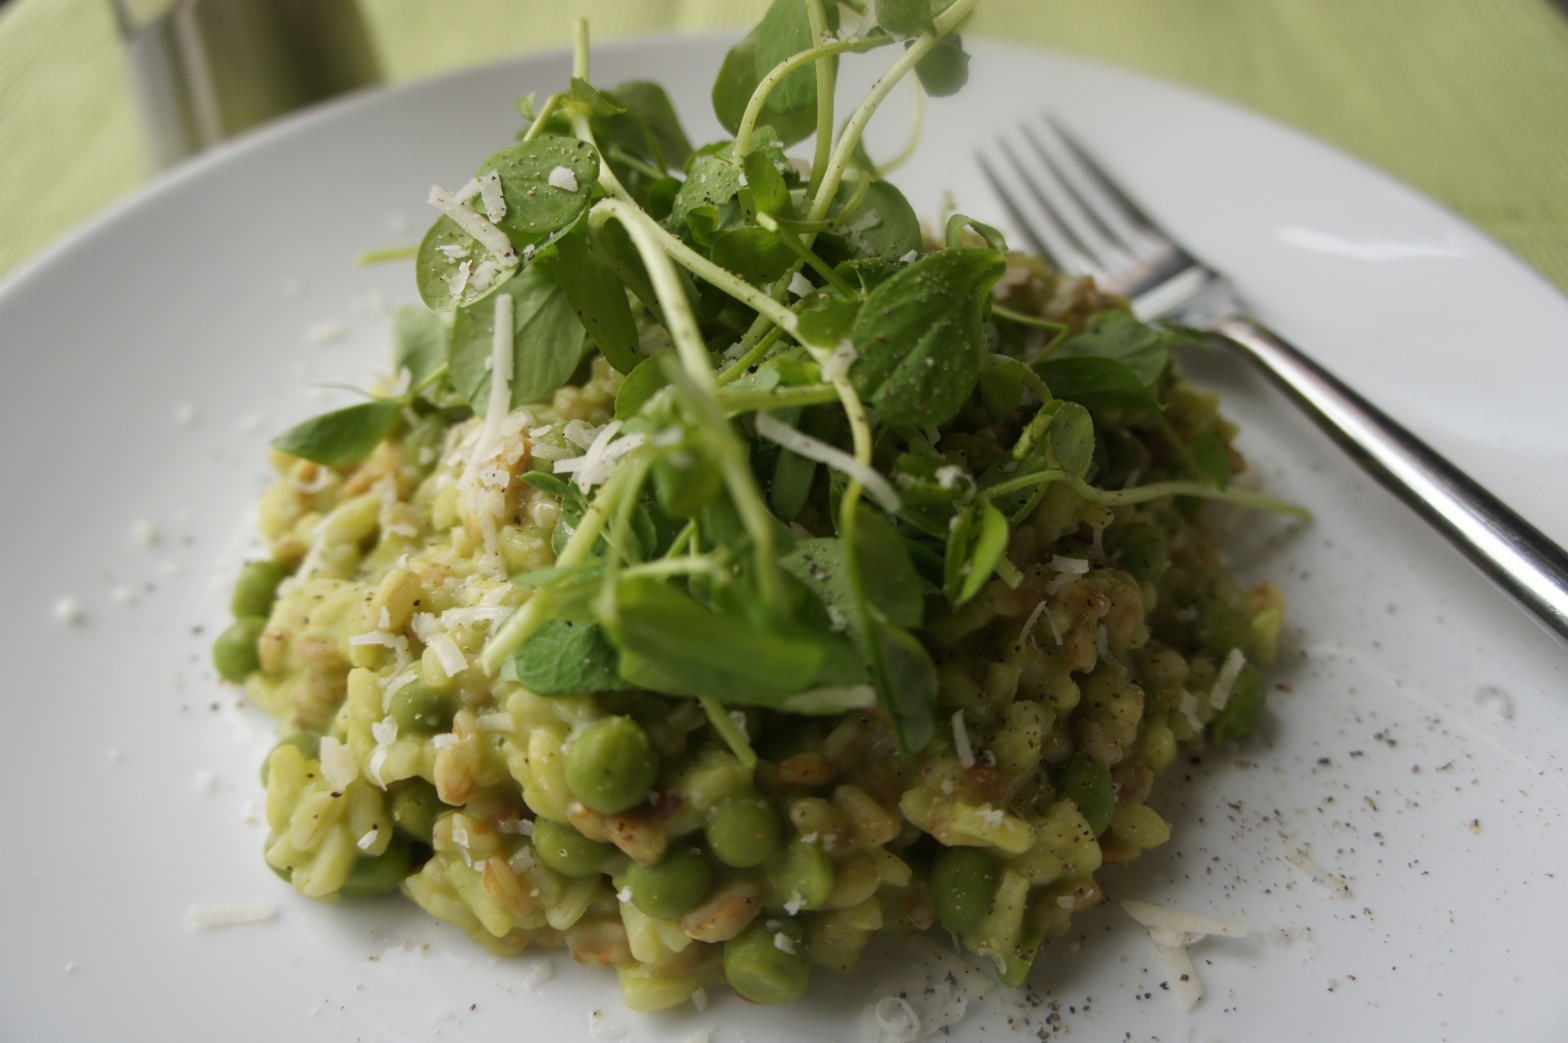 Pea, spinach and fava bean risotto